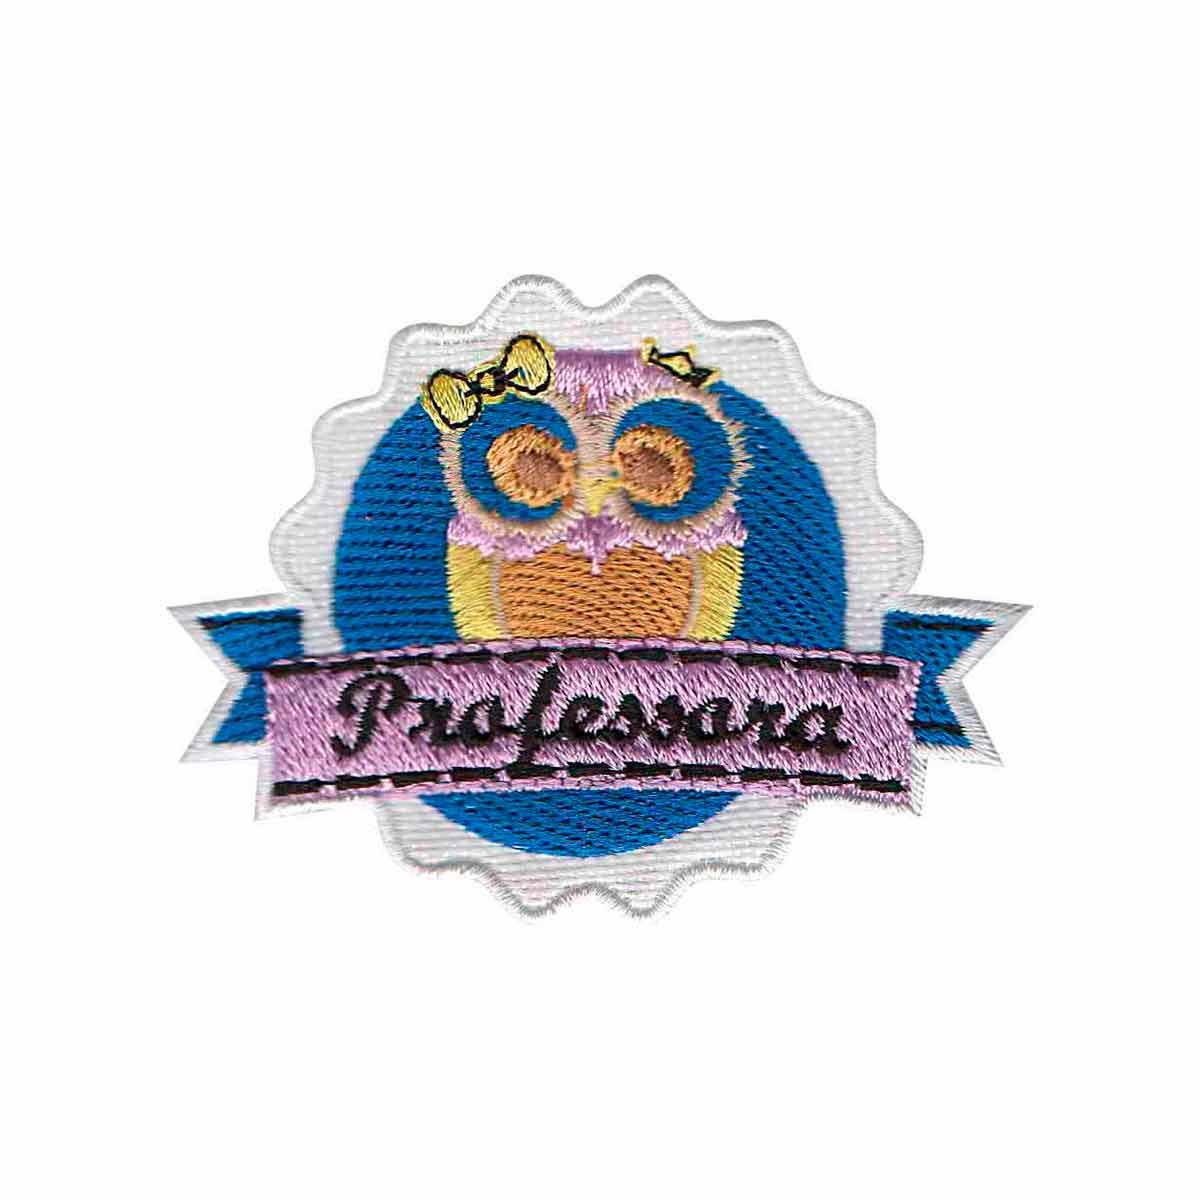 Patch Bordado - Símbolo Logo Coruja Professora Escolar AP00088-274  - Talysmã Bordados